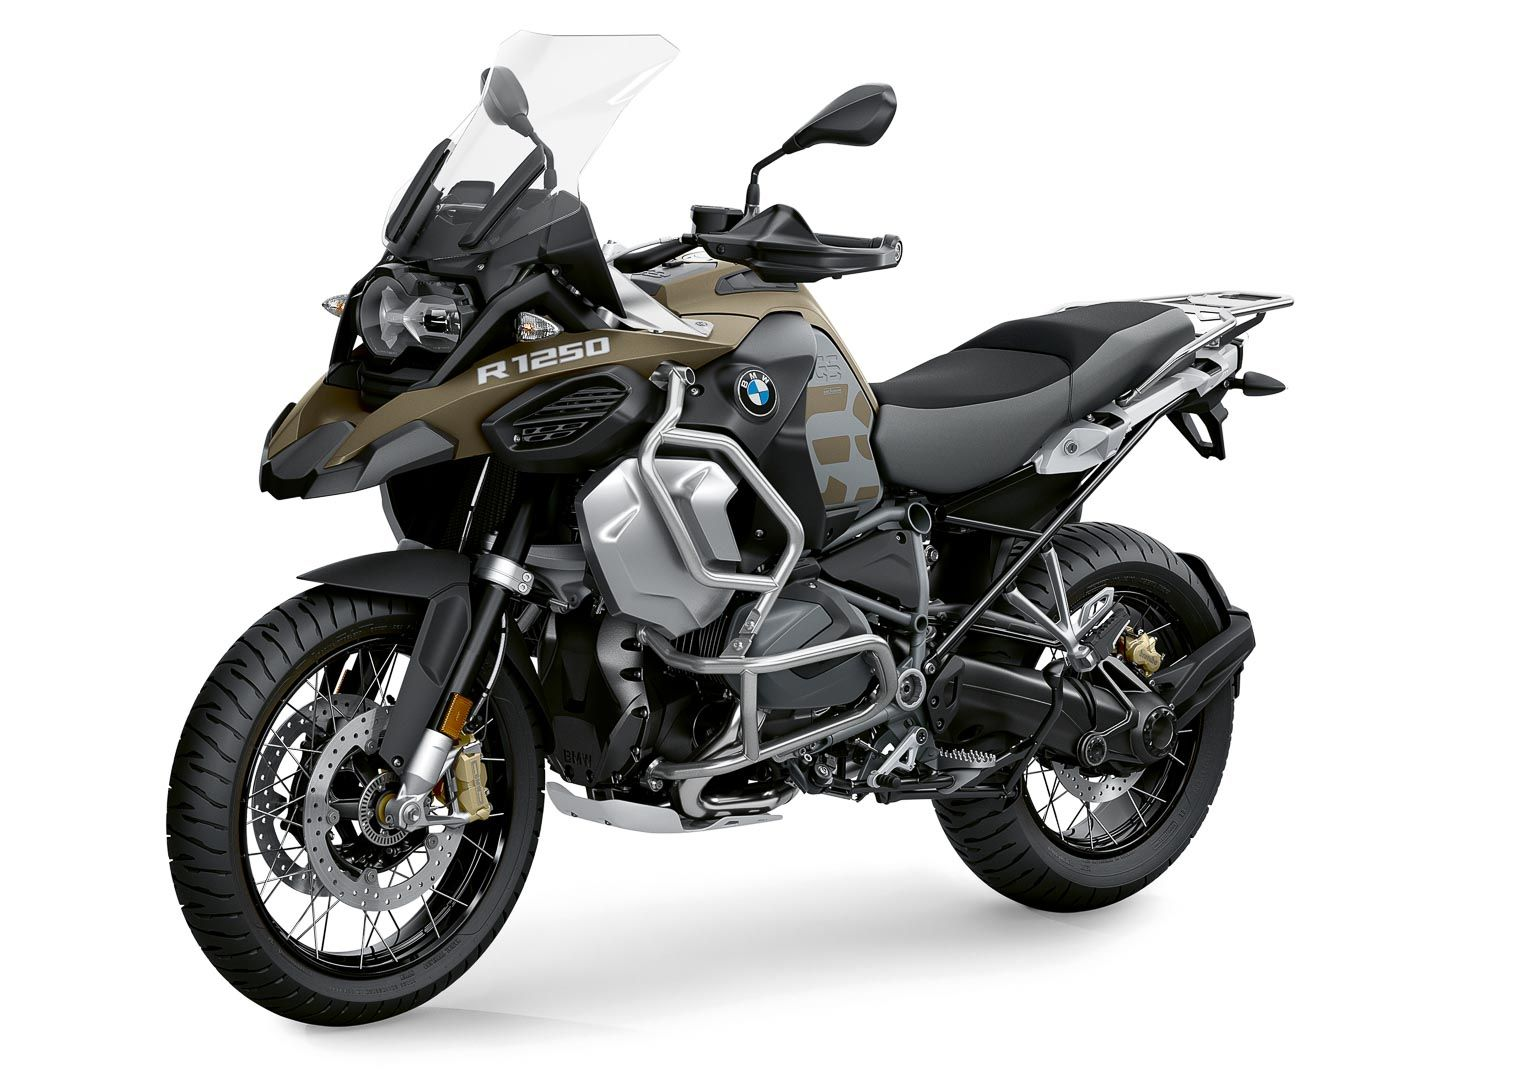 2020 Bmw R 1250 Gs Adventure Buyer S Guide Specs Prices Bmwfiend Com In 2020 Custom Bmw Adventure Time Marceline Adventure Bike